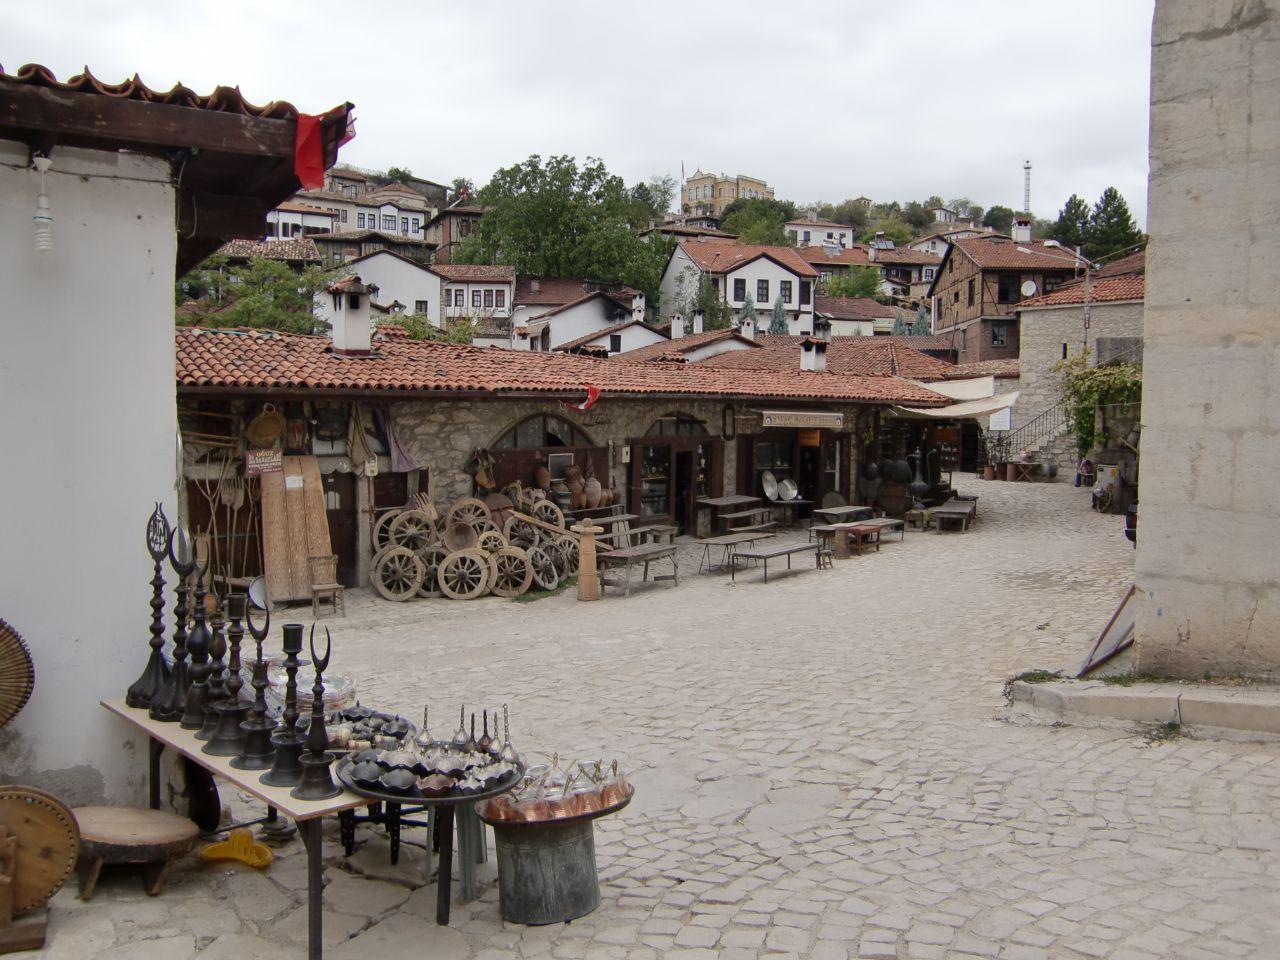 Rondreis Midden Turkije Safranbolu plein